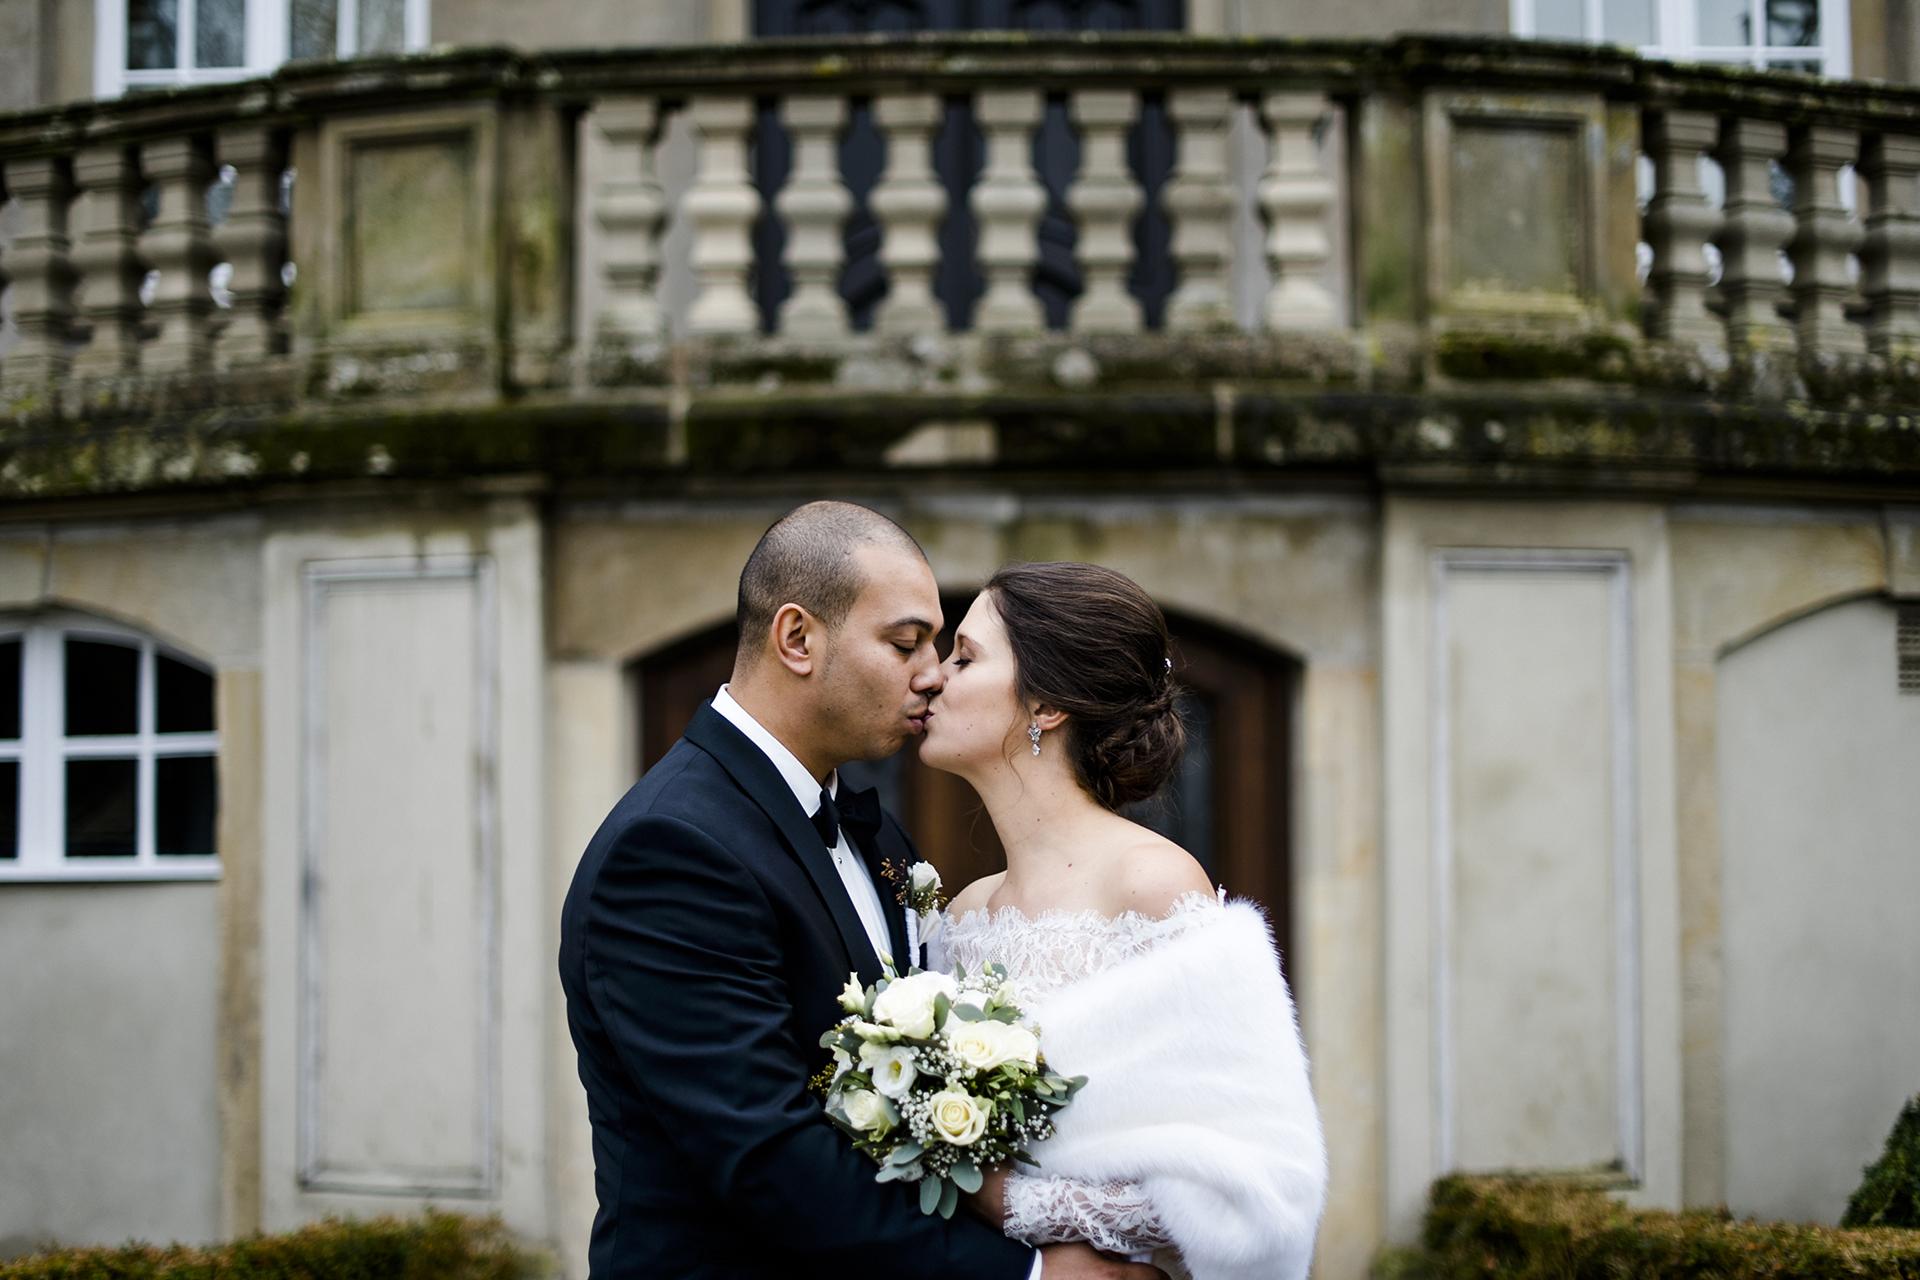 Hochzeitsreportage_J&D_062_Caroline Queda Fotografie